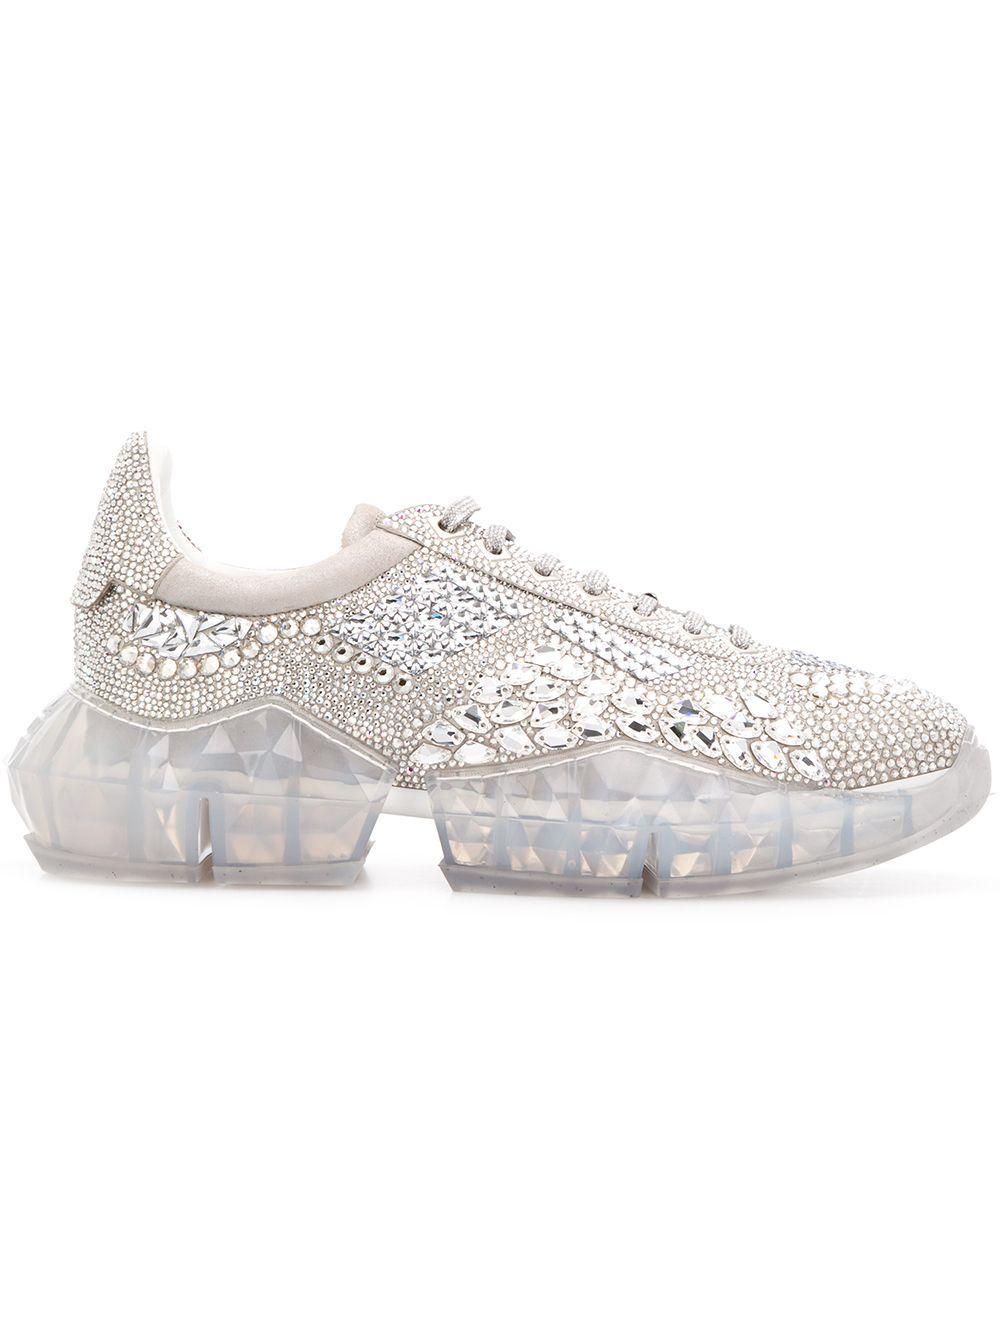 ebd2d4a027 JIMMY CHOO JIMMY CHOO 钻石形厚底运动鞋 - 银色. #jimmychoo #shoes ...